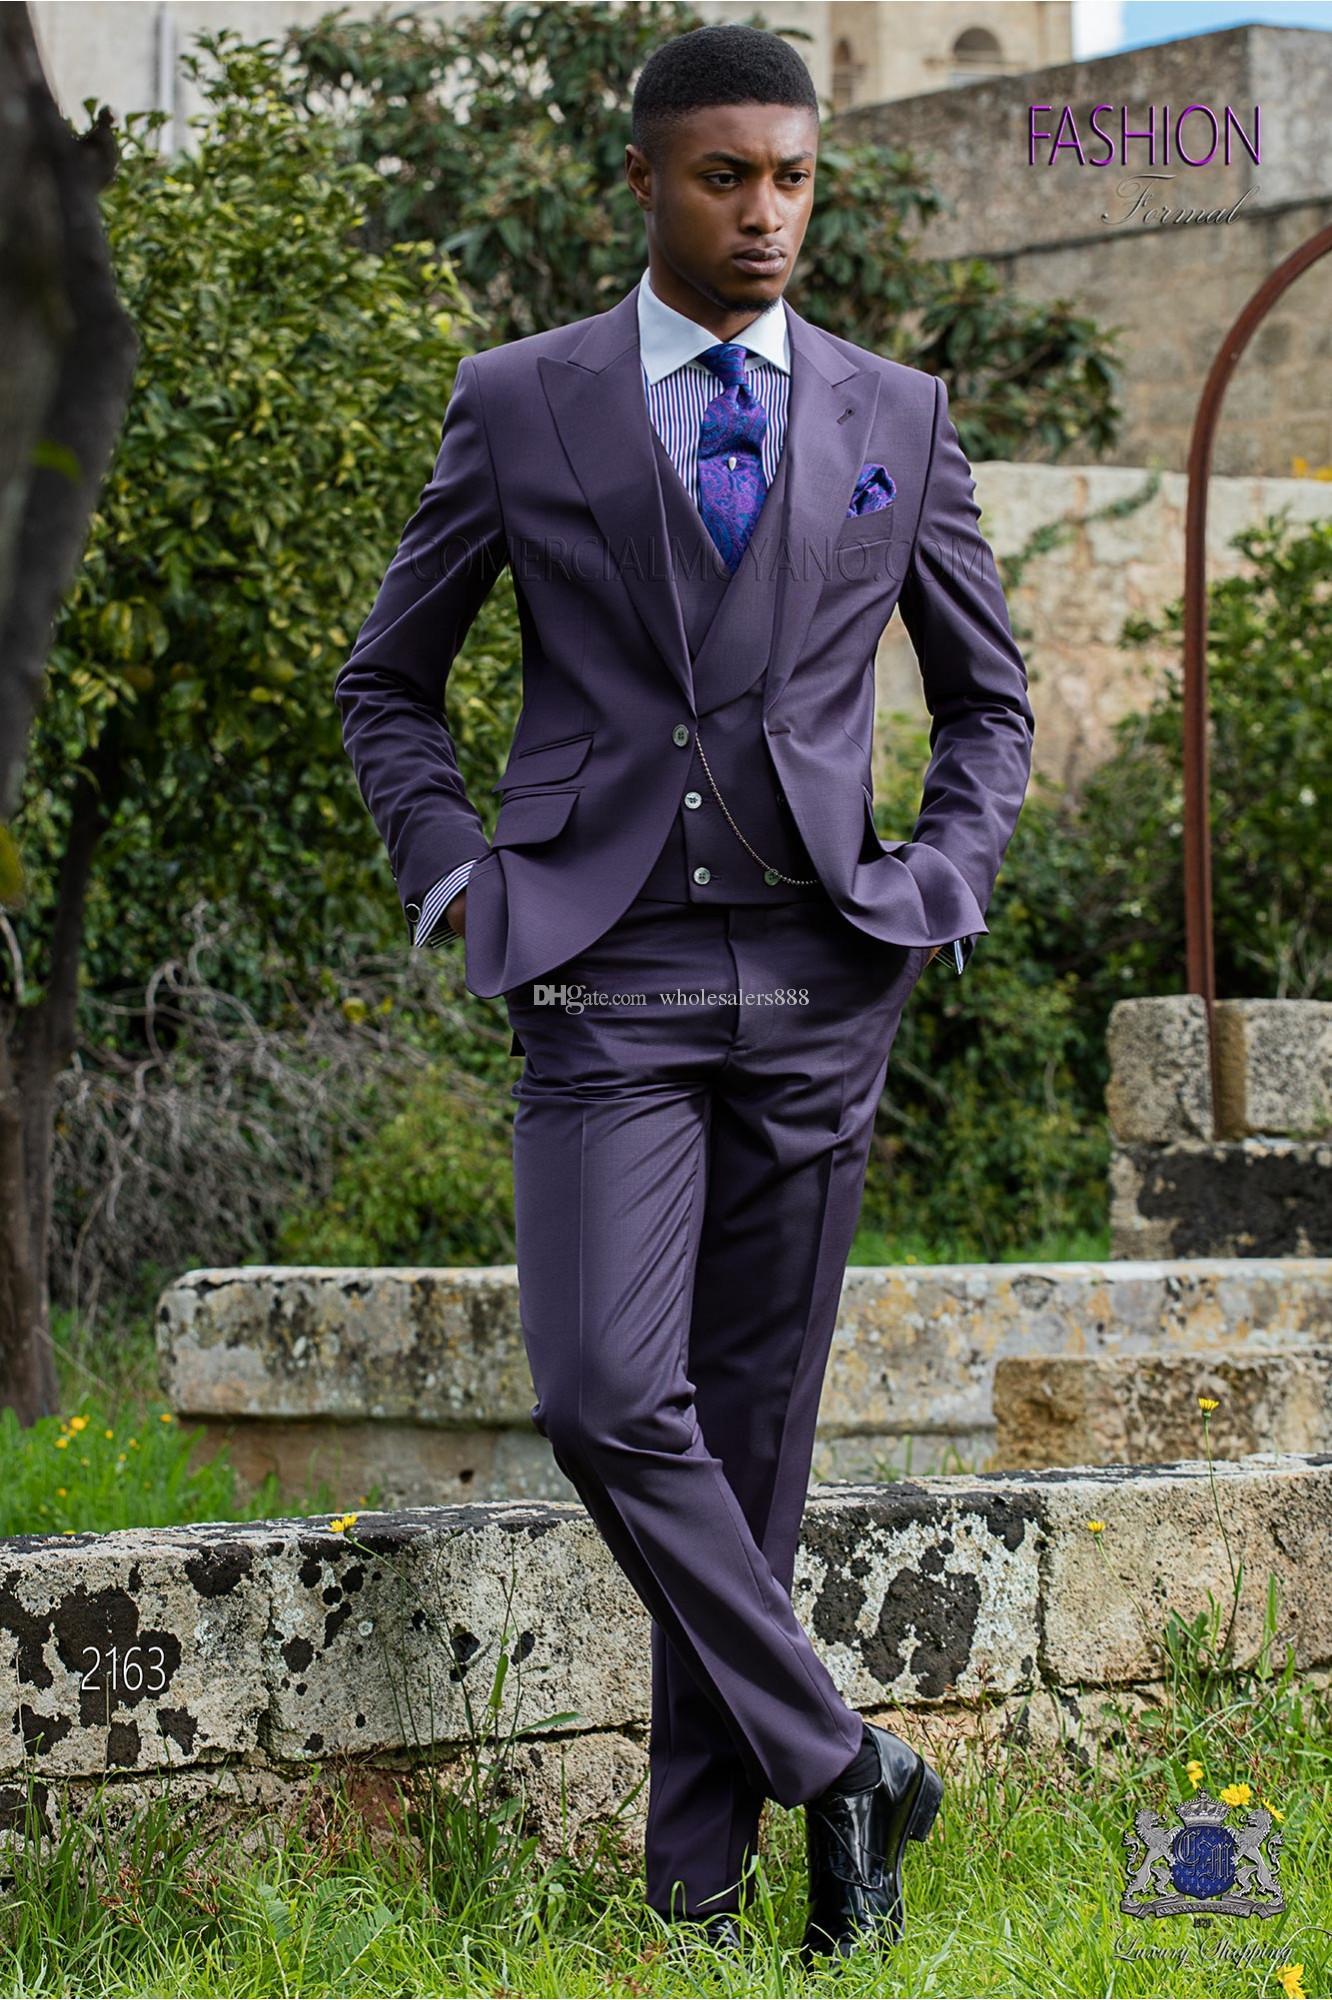 Nach Maß Groomsmen Dark Purple Bräutigam Smoking Spitze Revers Männer Anzüge Hochzeit Bester Mann-Bräutigam (Jacket + Pants + Vest) L120